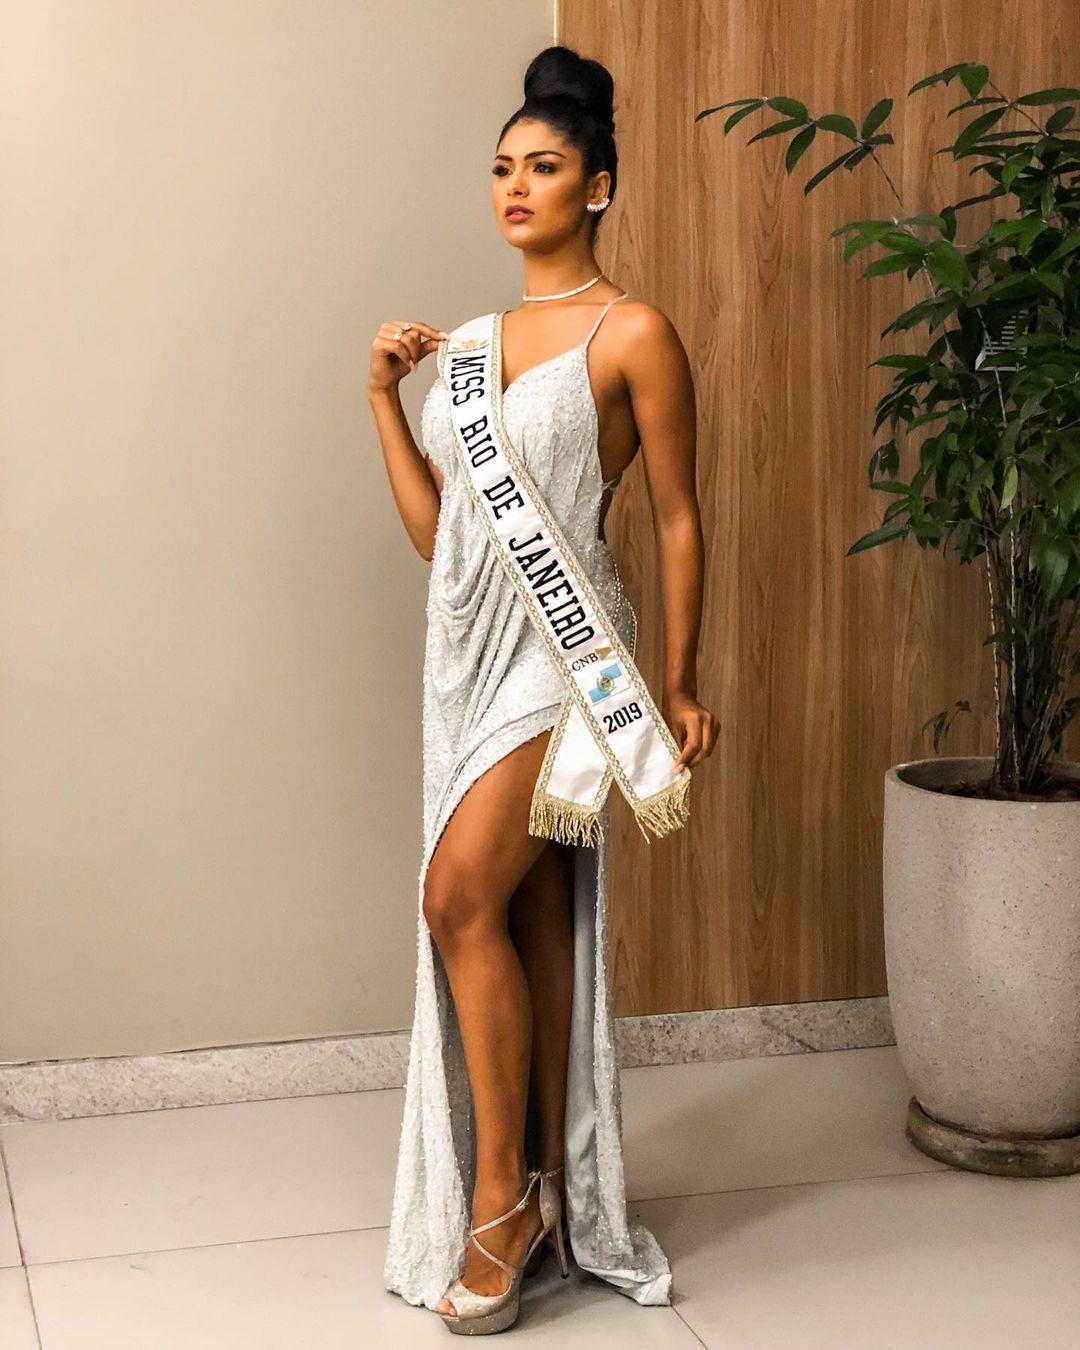 esthefane souza, top 20 de miss brasil mundo 2019. - Página 7 21282723